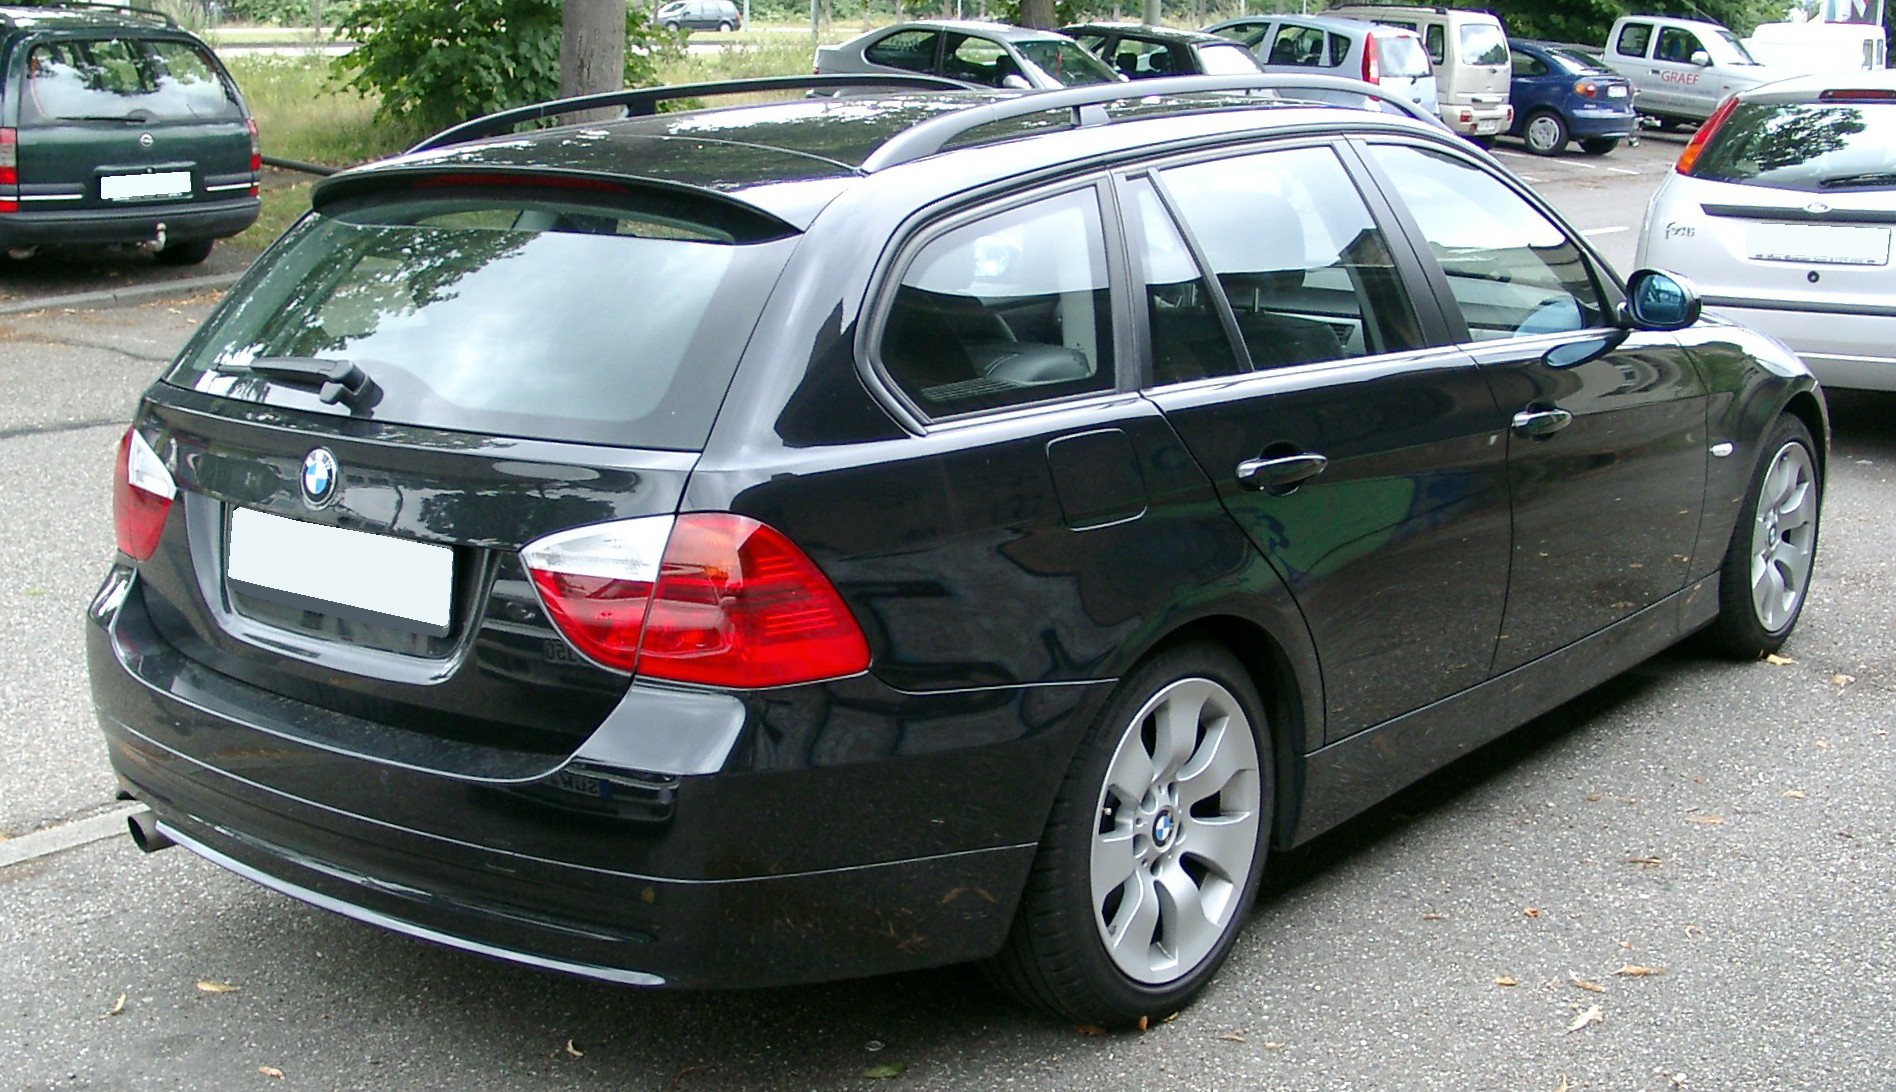 Bmw E90 Wiki >> File:BMW E90 Kombi rear 20080722.jpg - Wikimedia Commons